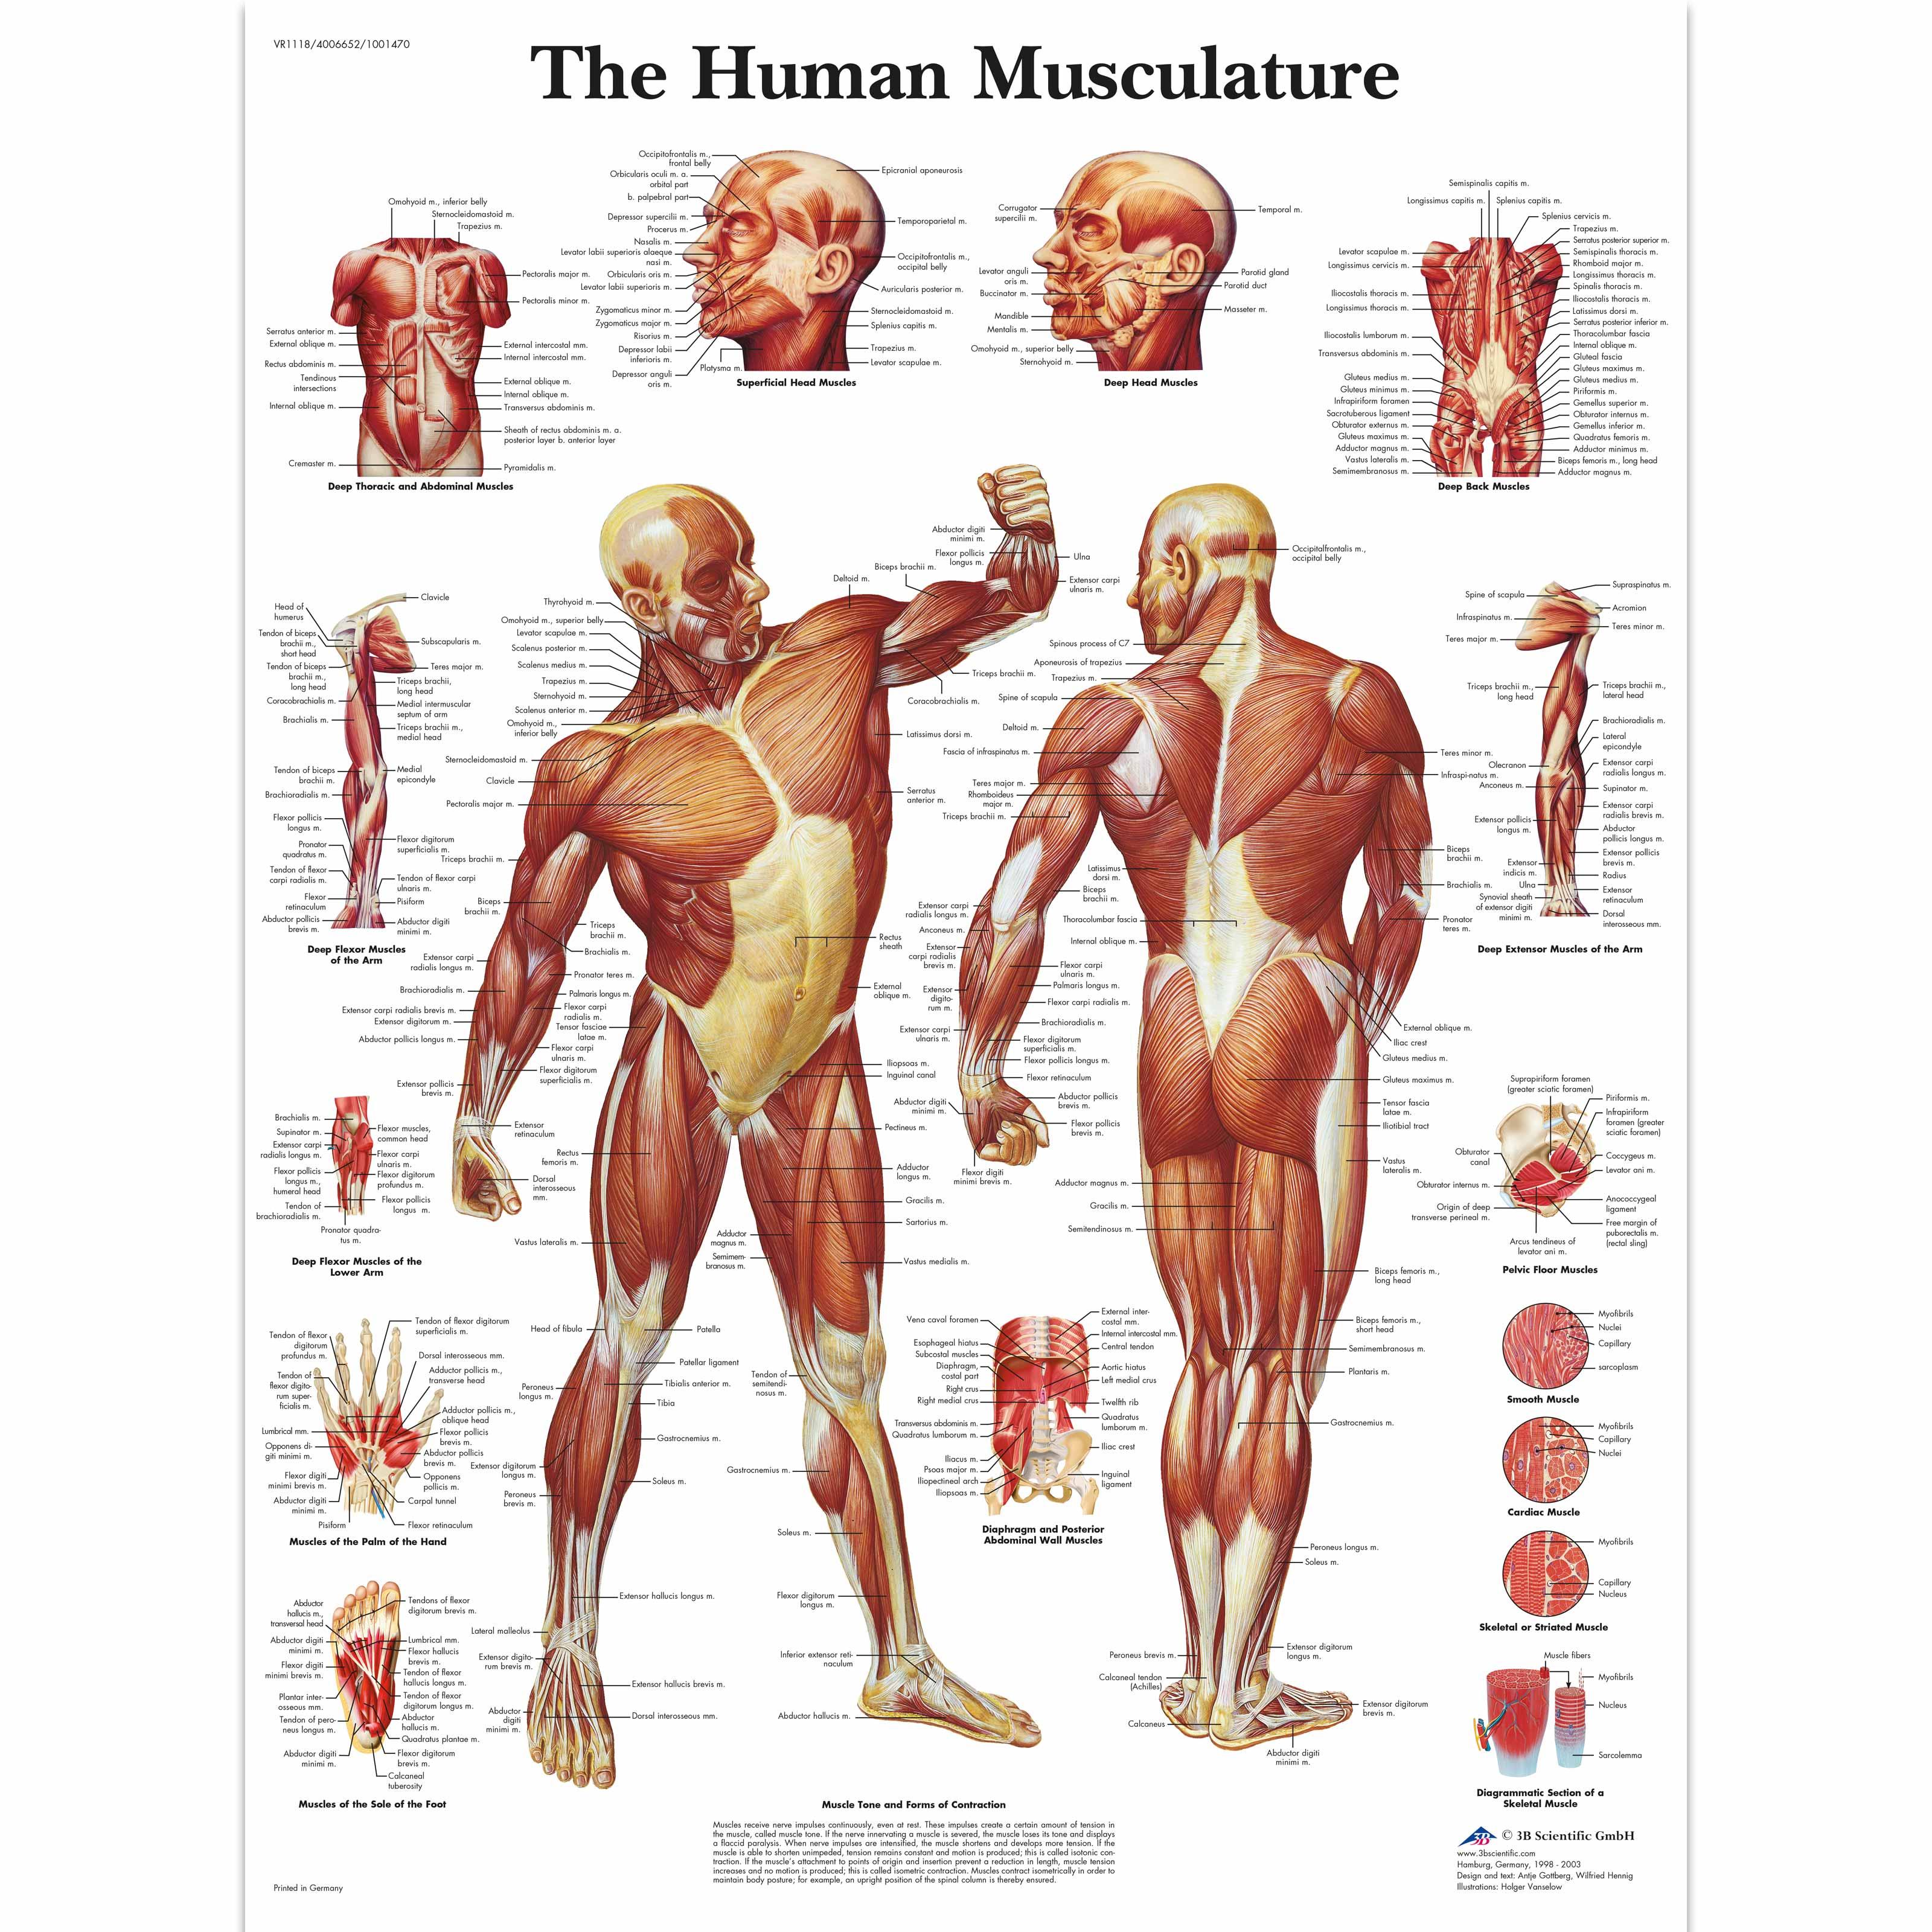 Pôster dos Músculos Humanos - 4006652 - VR1118UU - Músculo - 3B ...